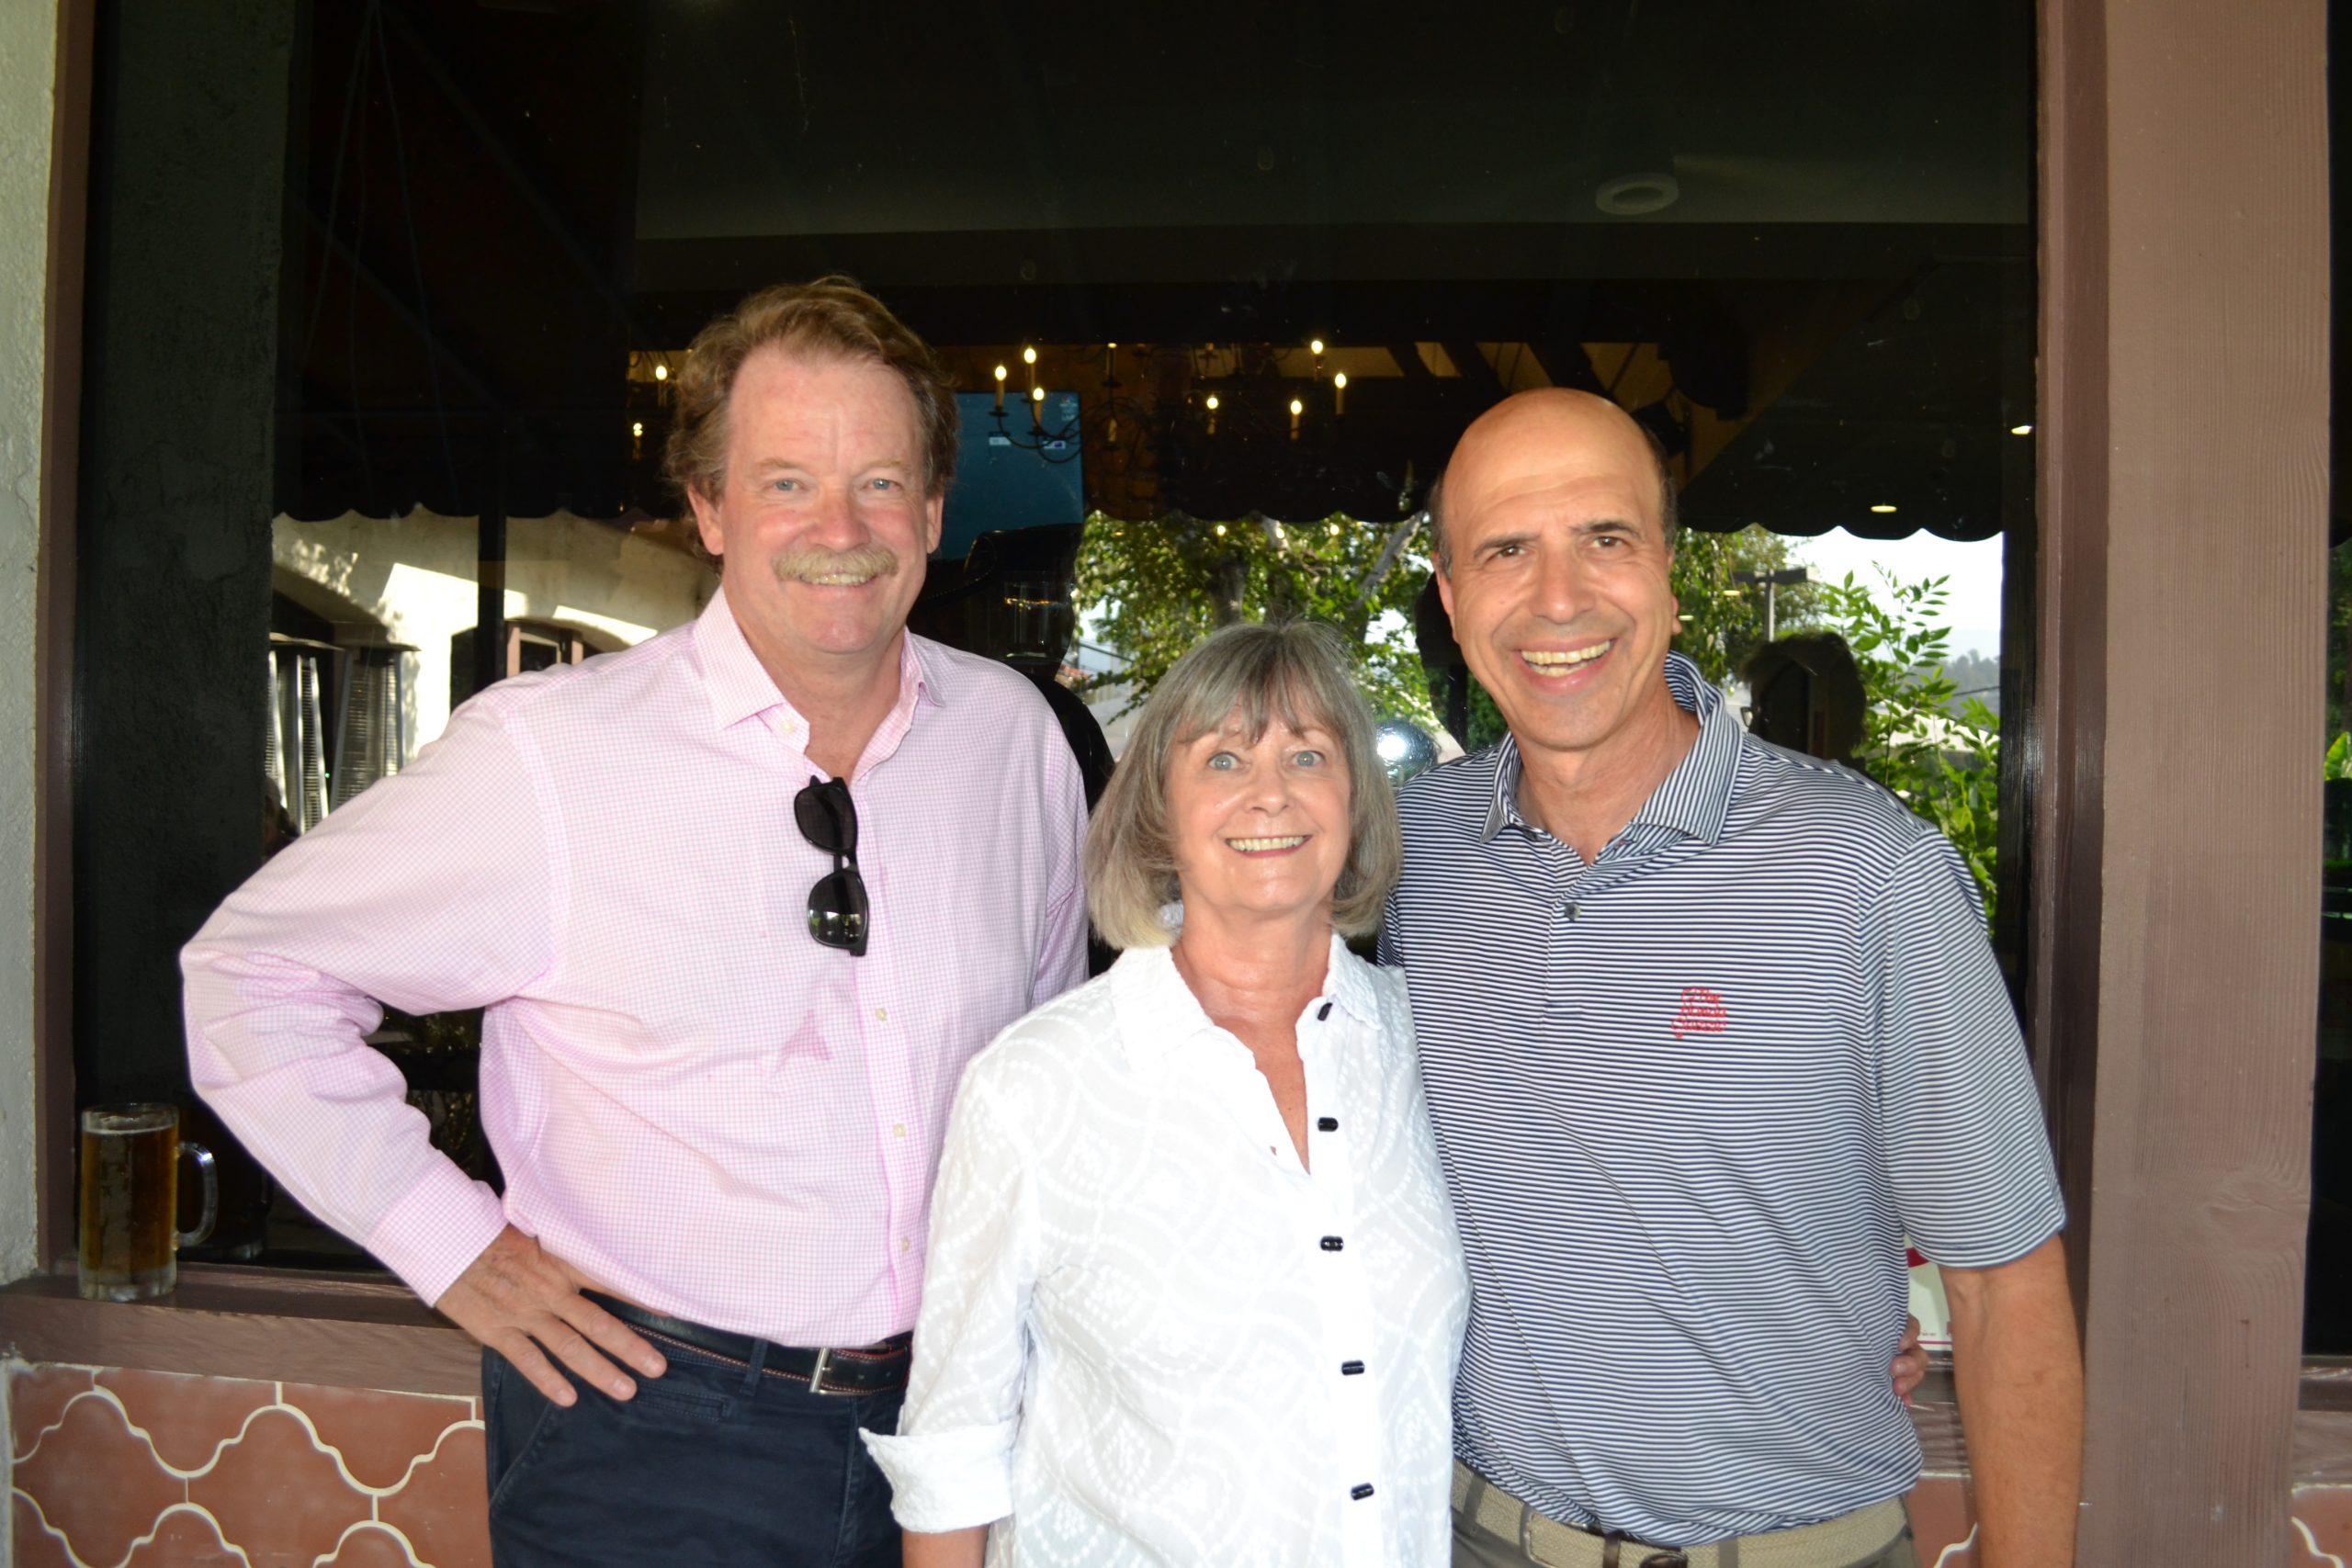 Civitas_Rick Gould, Margaret McAustin and Darryl Dunn 0208